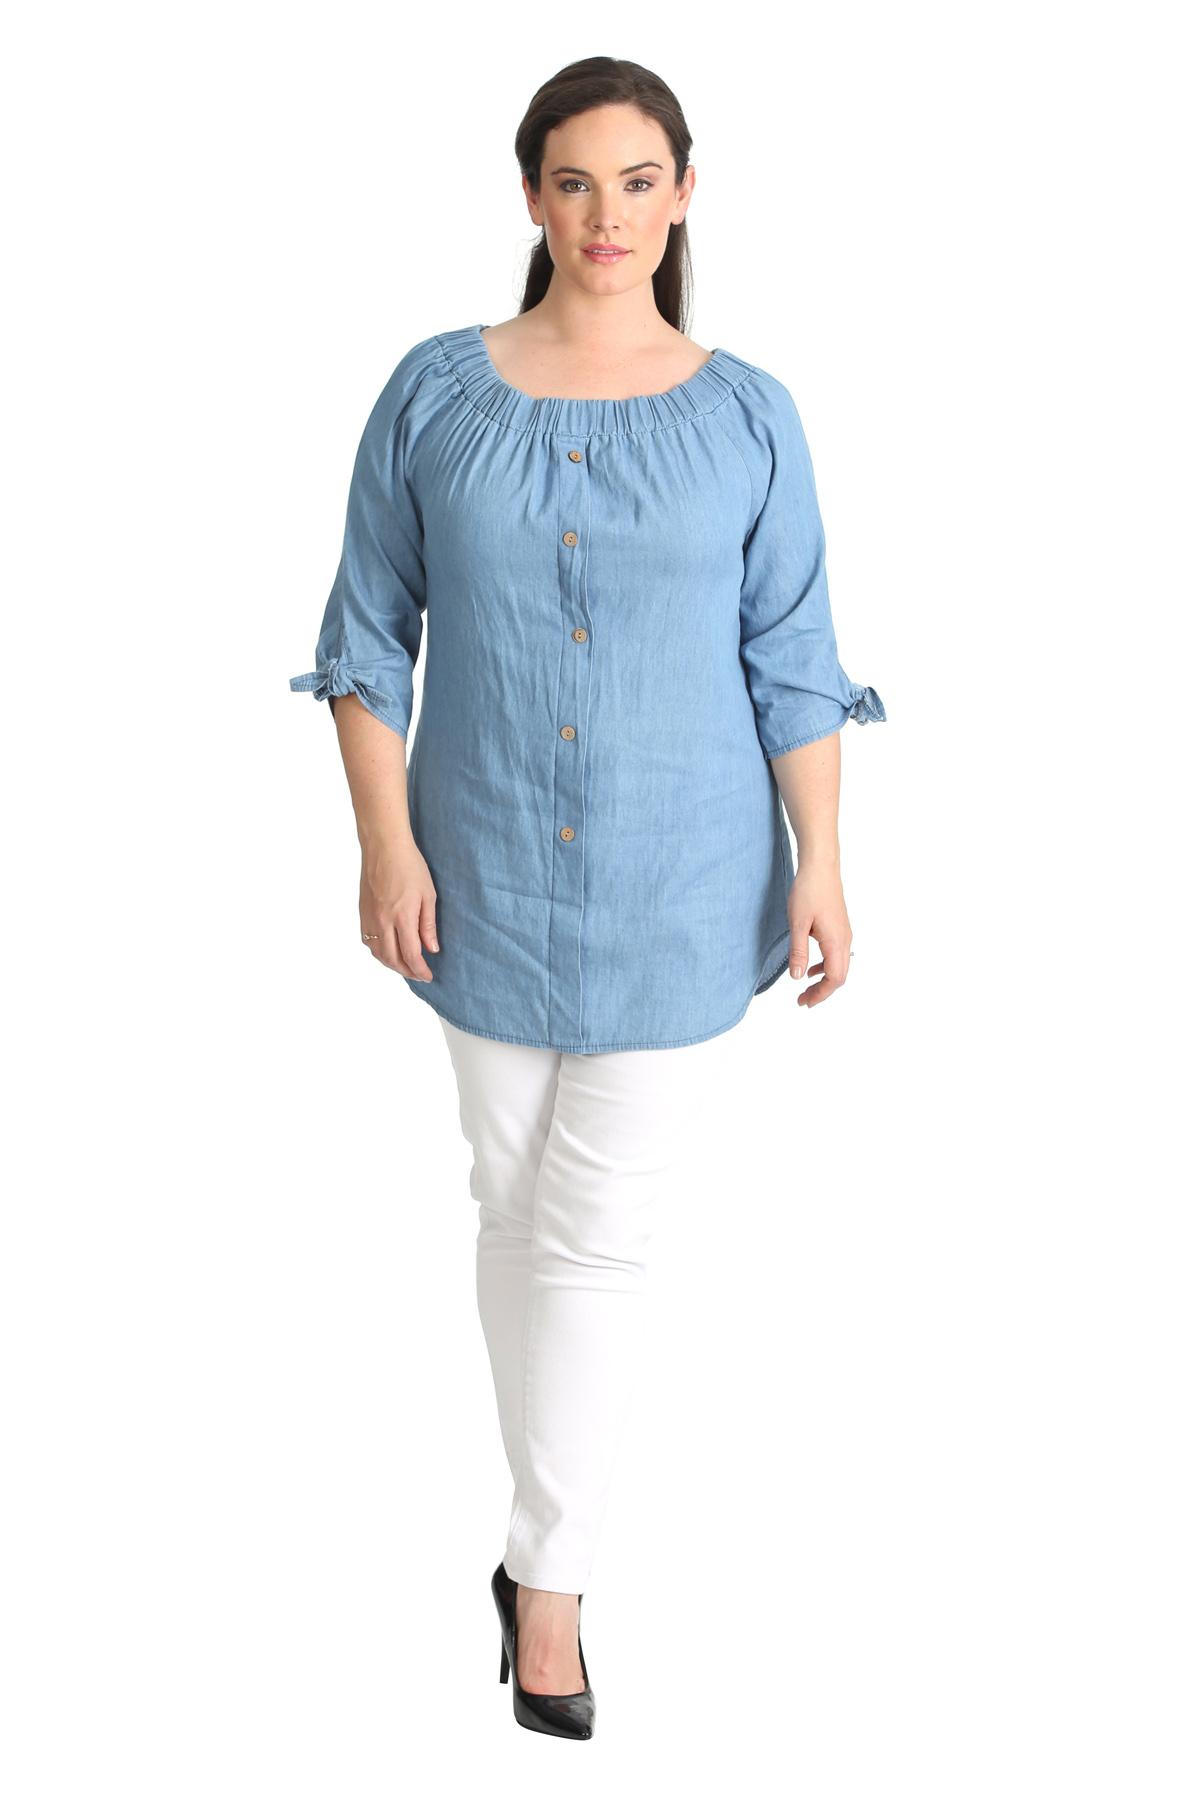 New Ladies Plus Size Top Bardot Button Denim Style Shirt Elastaicated Nouvelle